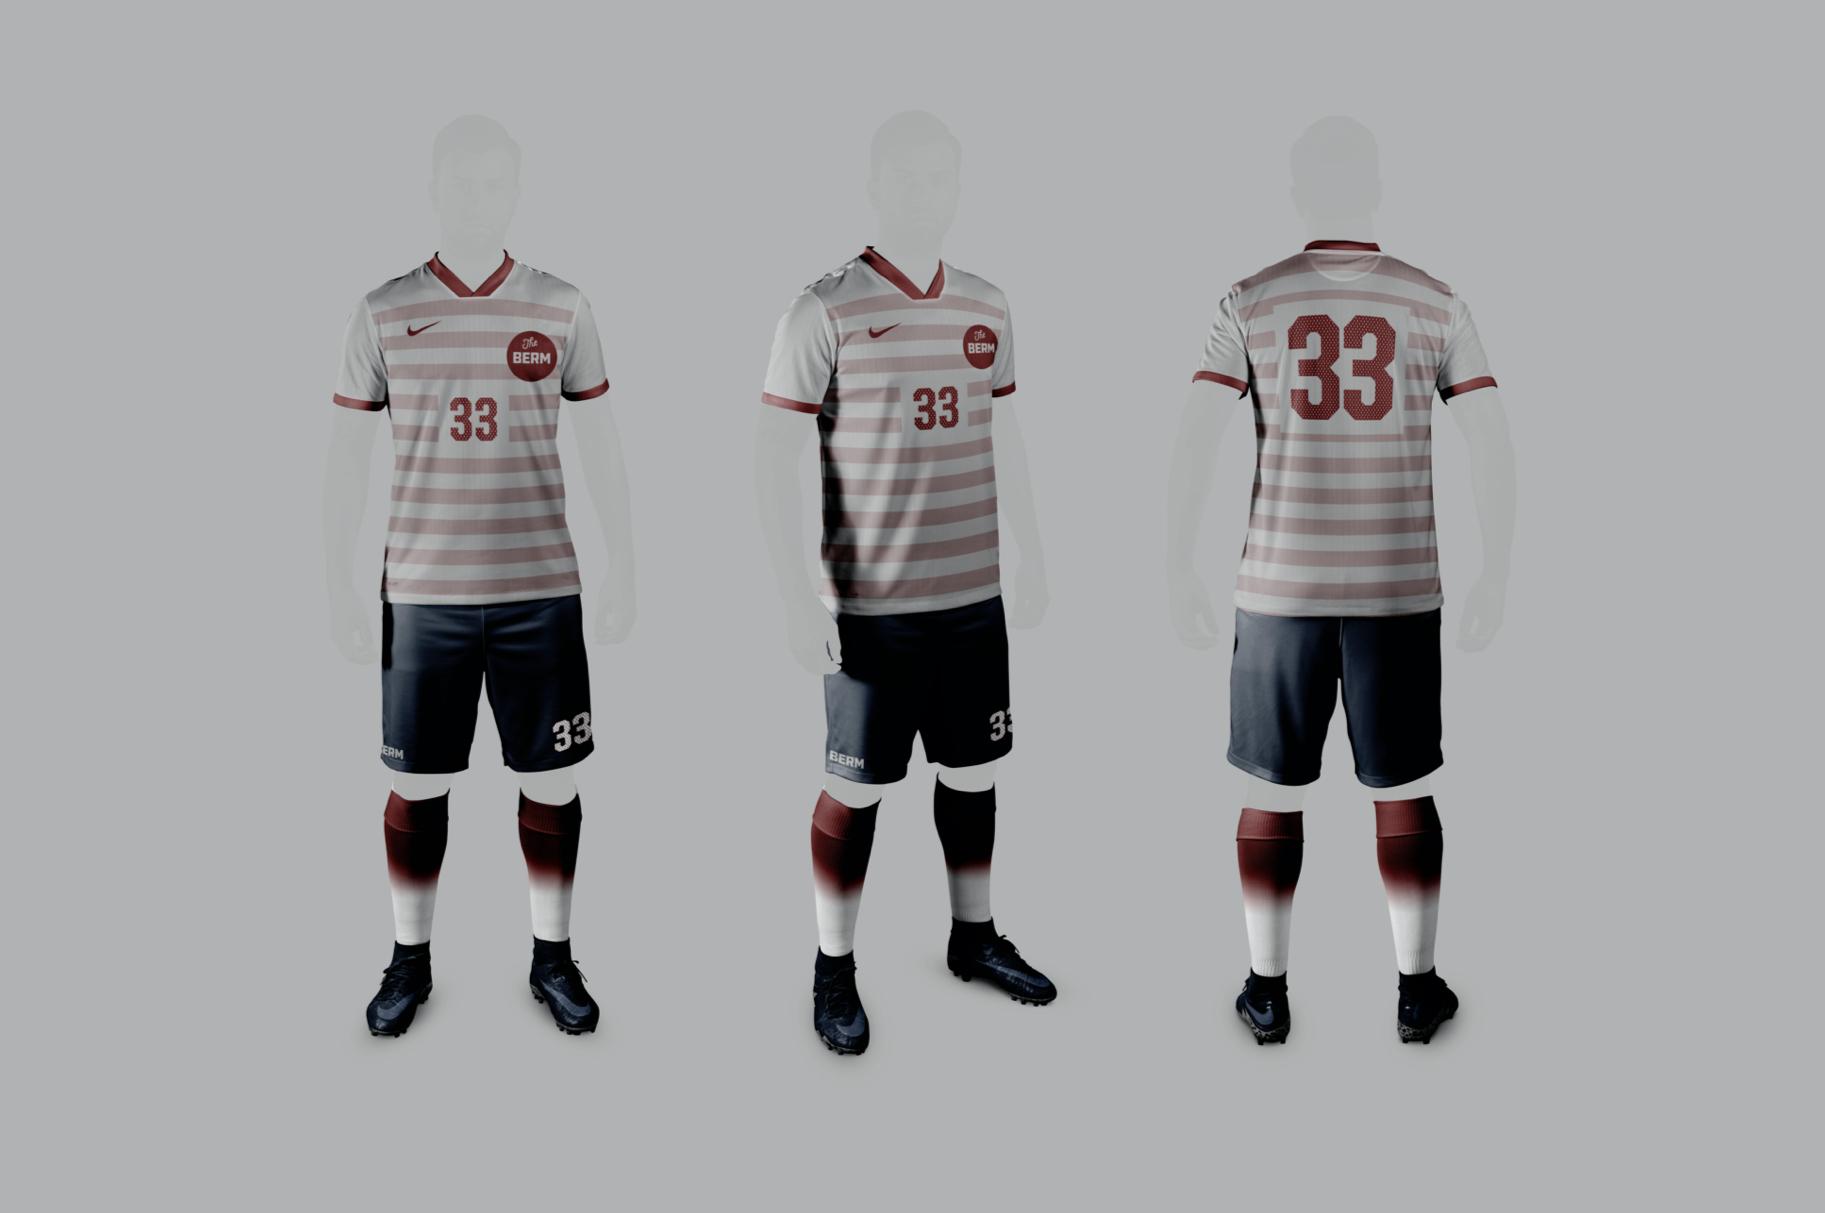 Home soccer uniform